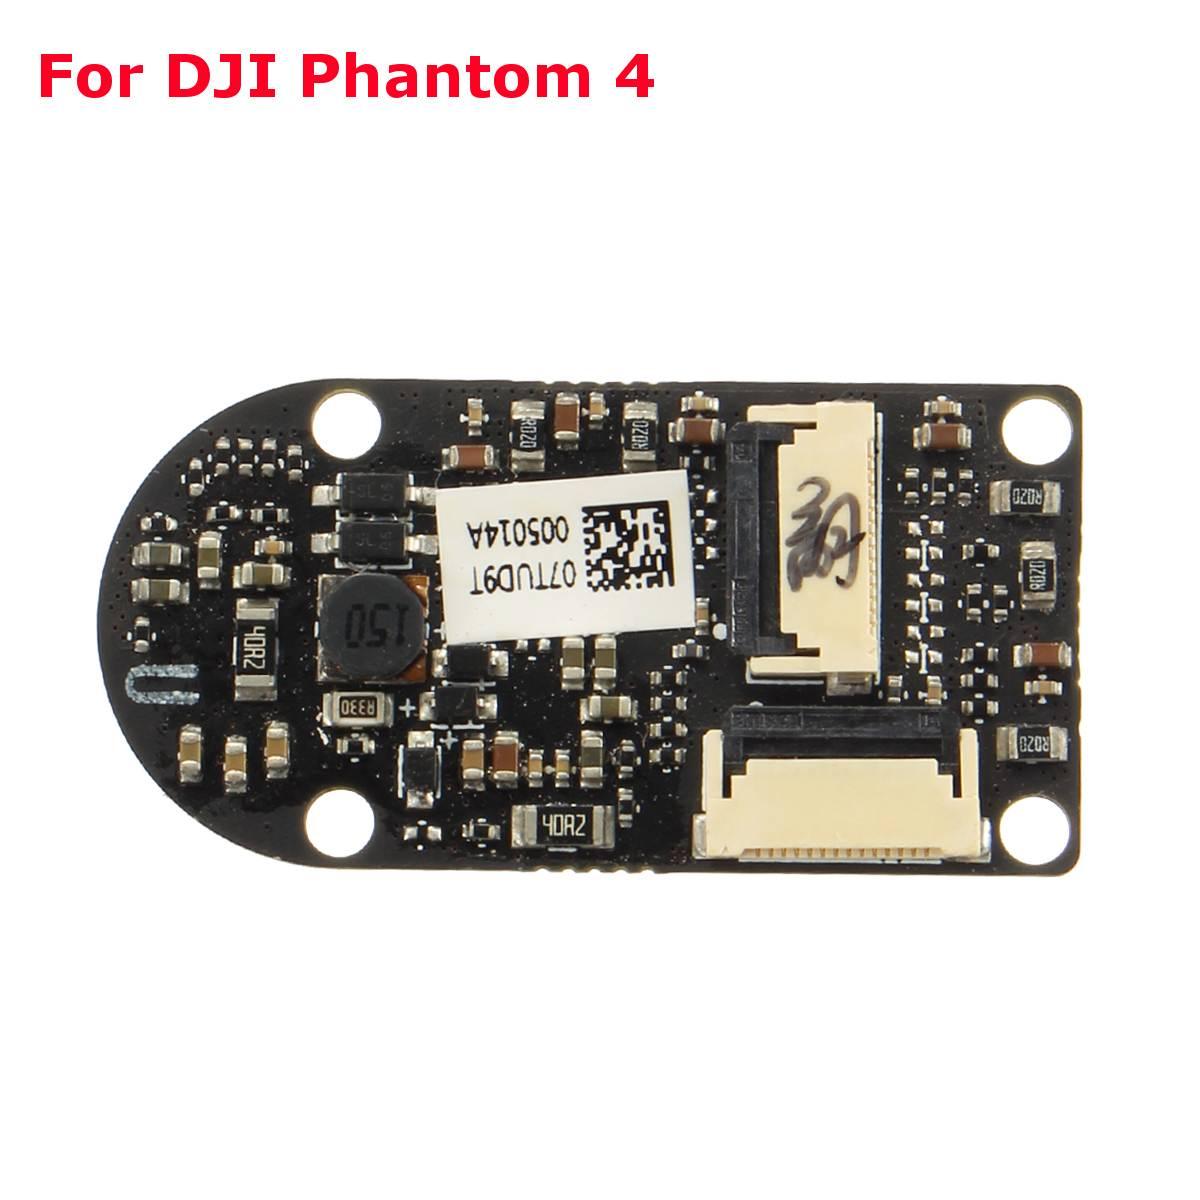 Durable Metal Repair Parts Practical Circuit Board ESC Chip Roll/Yaw Motor Drone Accessories Professional For DJI Phantom 4 Pro